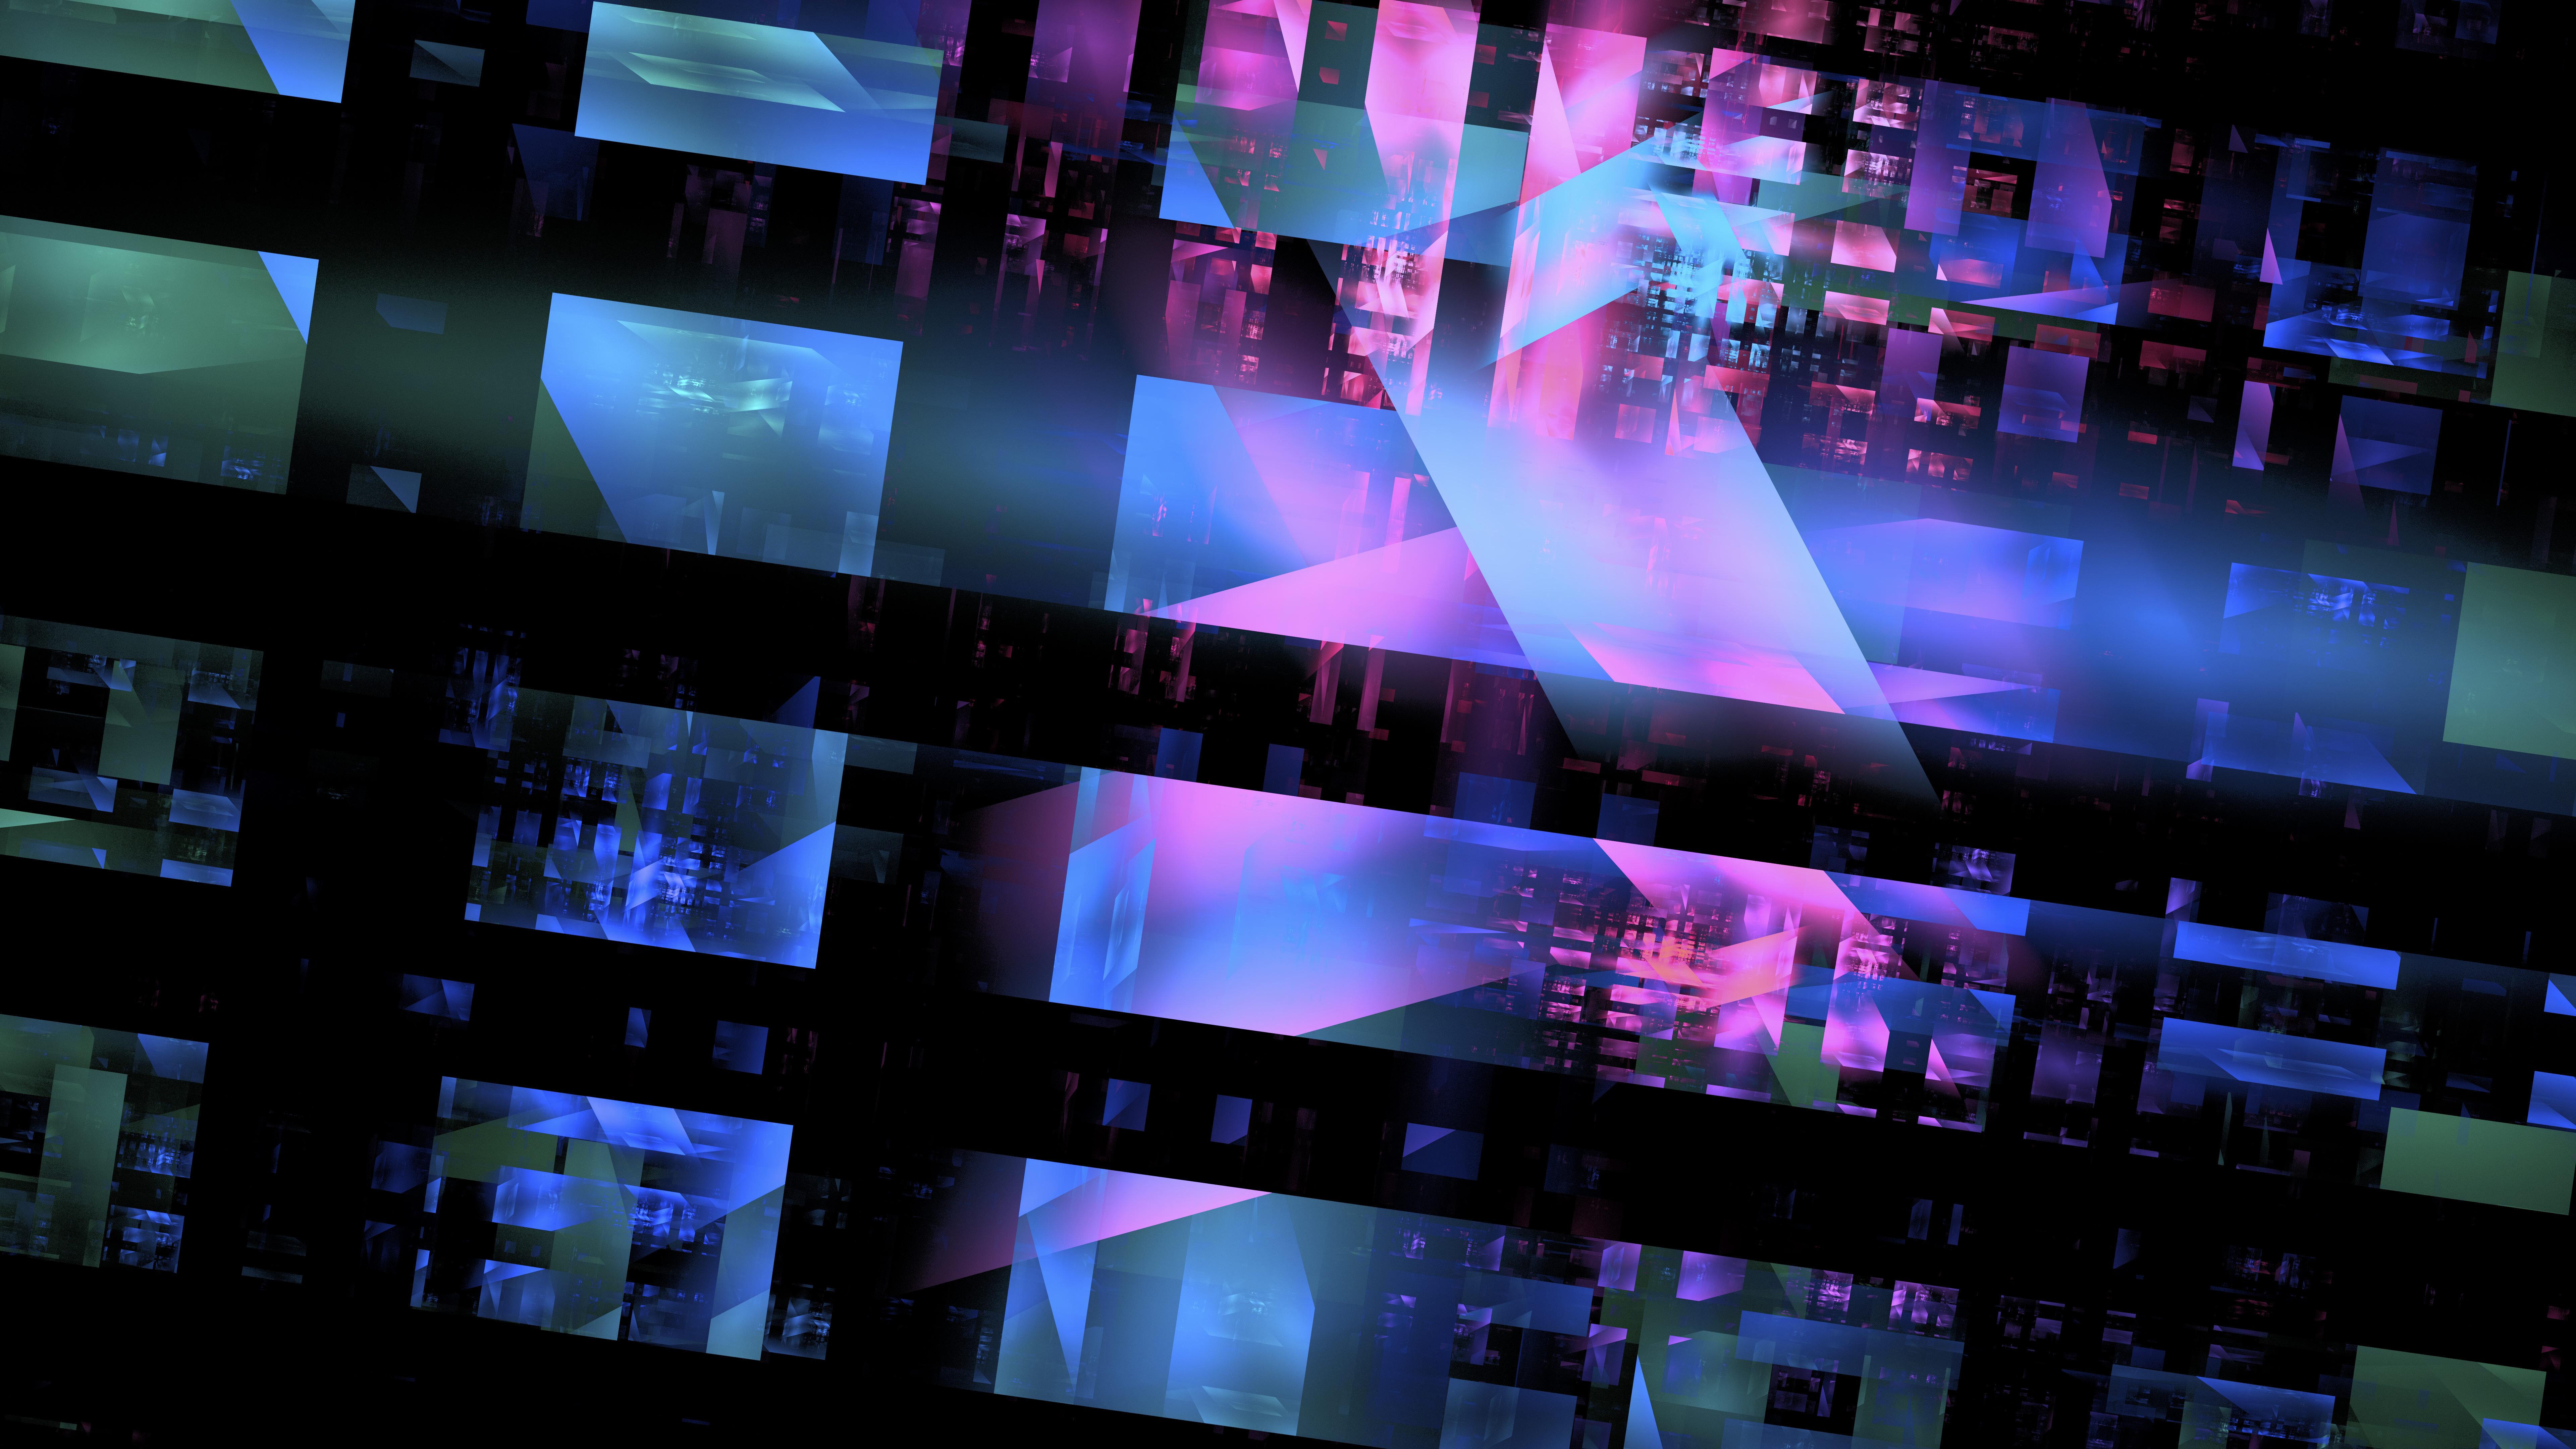 fractal-apophysis-8k-uh.jpg